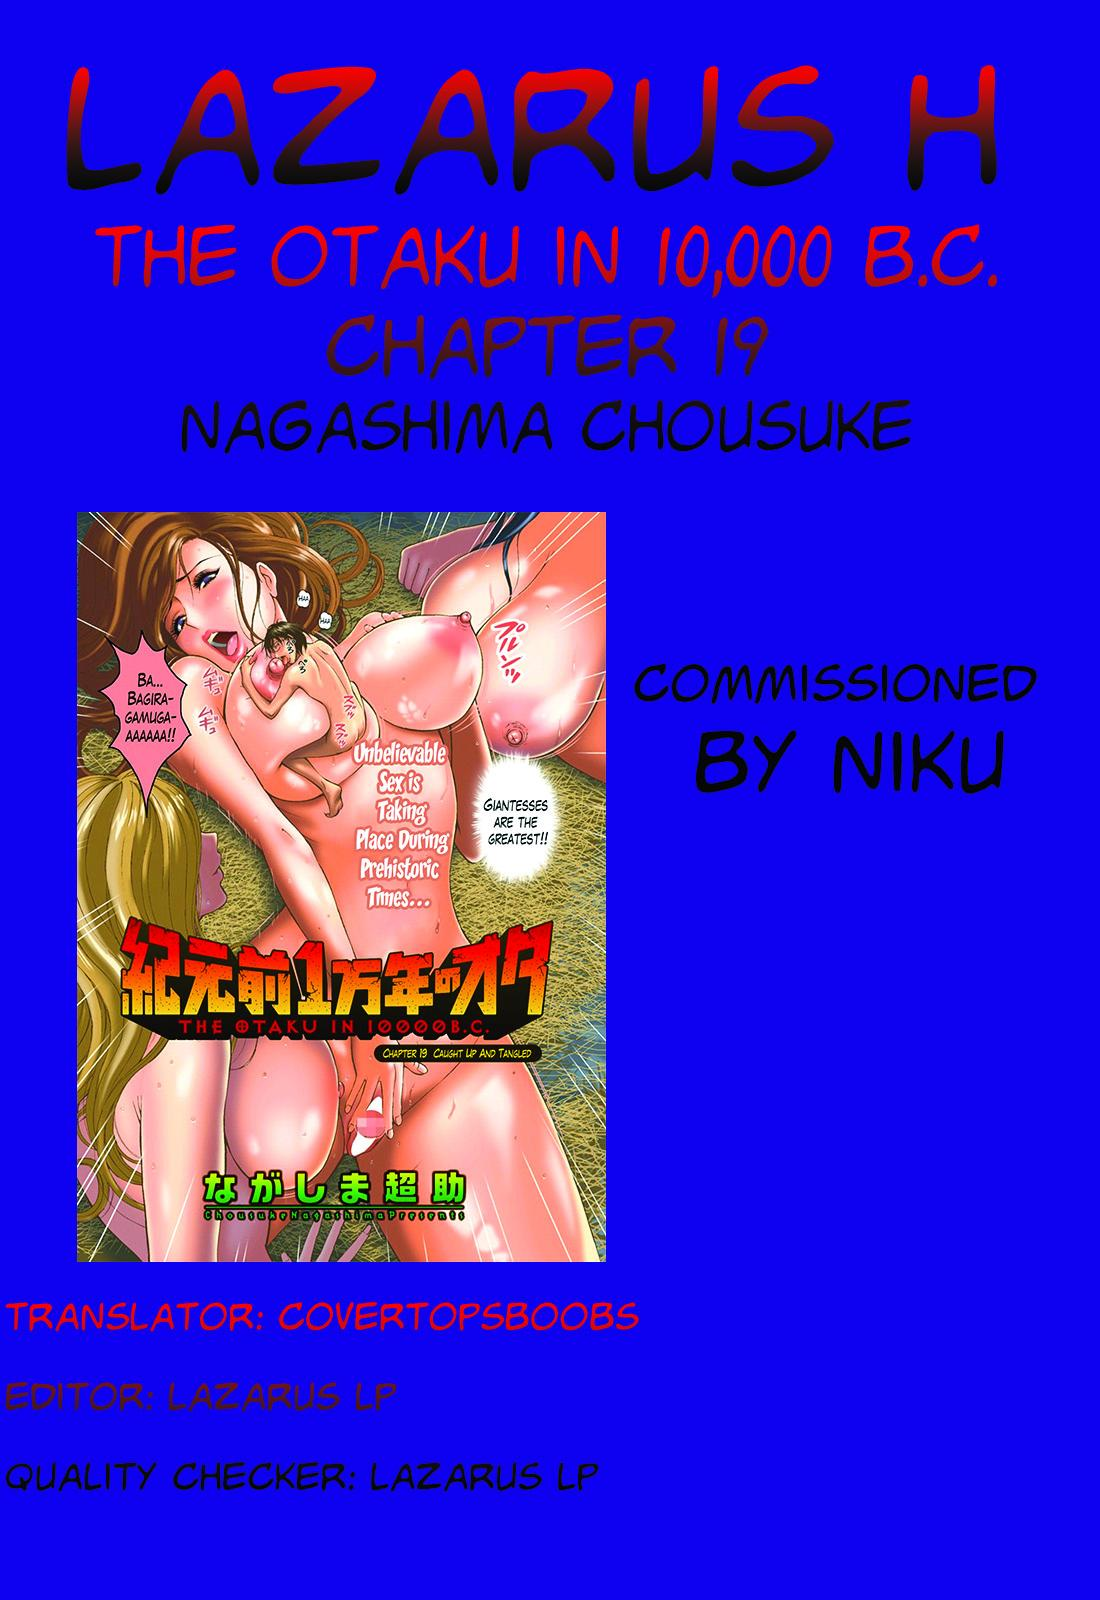 Kigenzen 10000 Nen no Ota | The Otaku in 10,000 B.C. 365